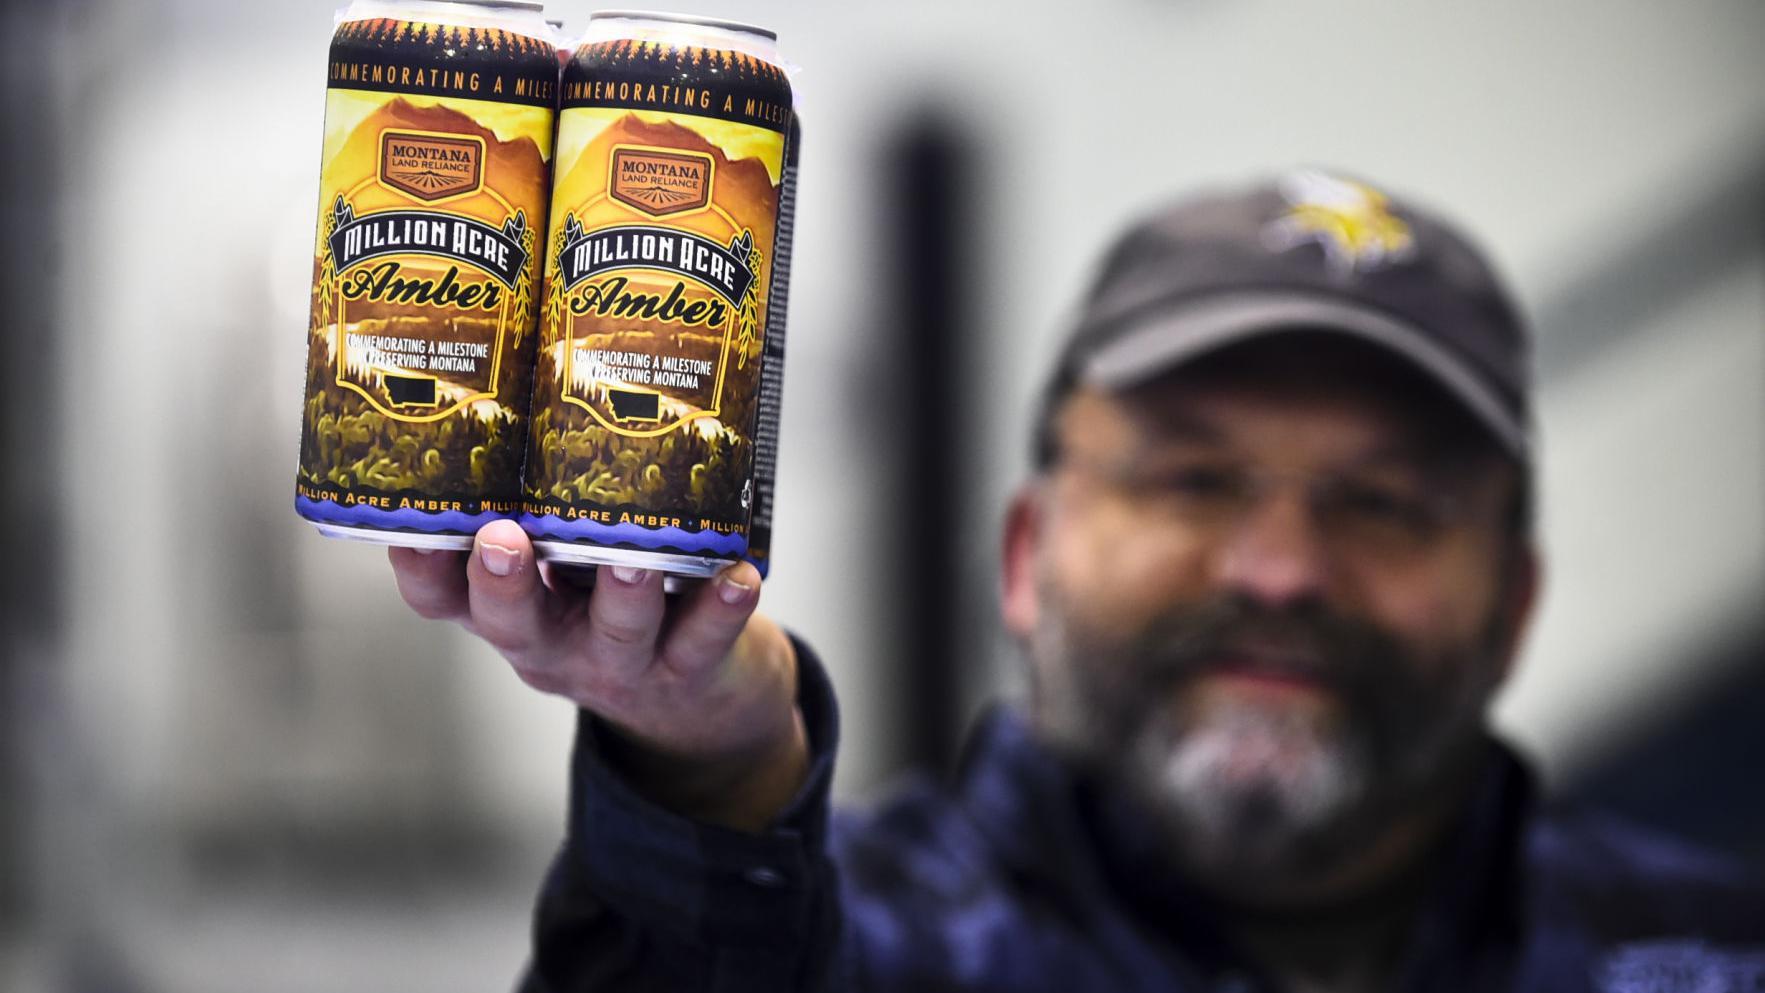 Million Acre Amber: New Helena brew celebrates land conservation milestone